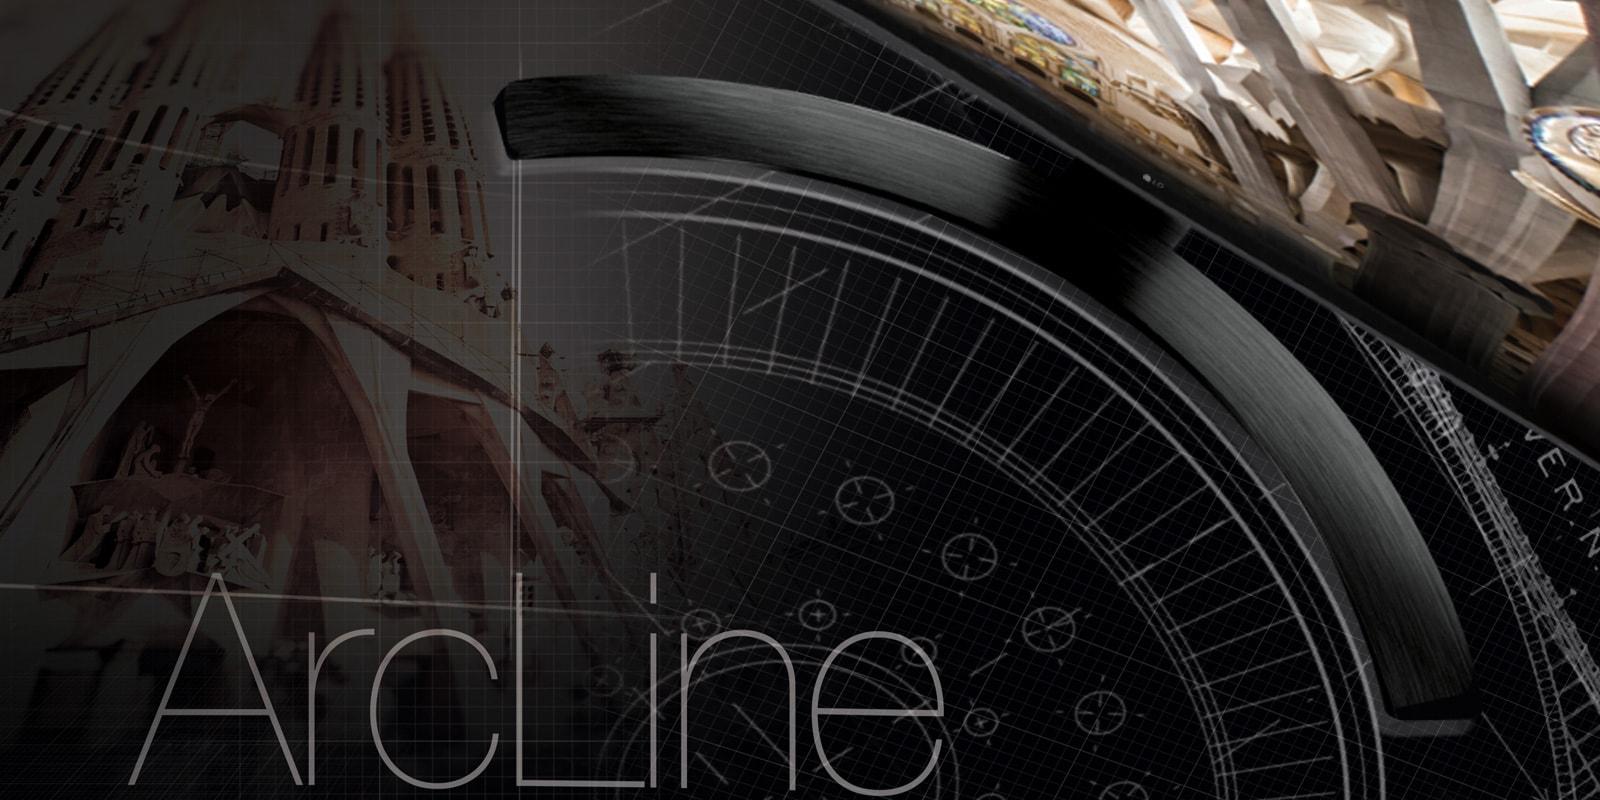 02_ArcLine-Stand-22-24-27MP58